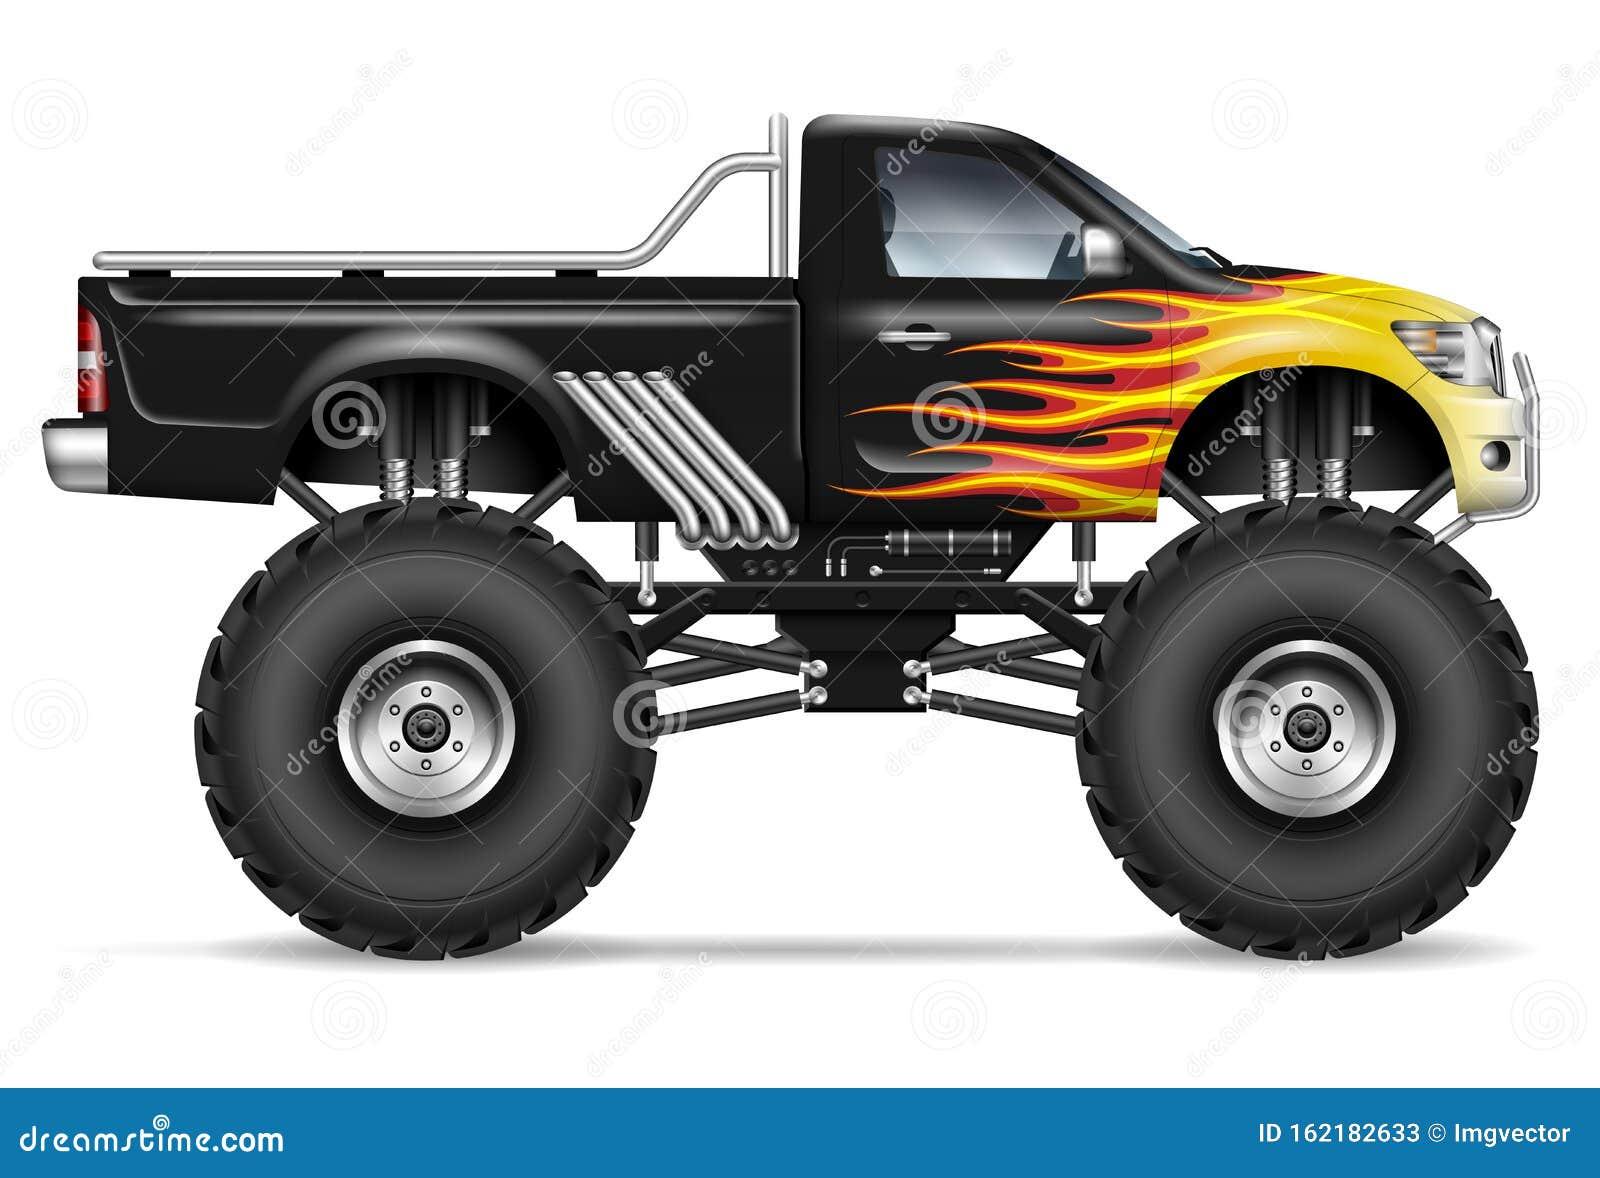 Black Monster Truck Stock Illustrations 345 Black Monster Truck Stock Illustrations Vectors Clipart Dreamstime